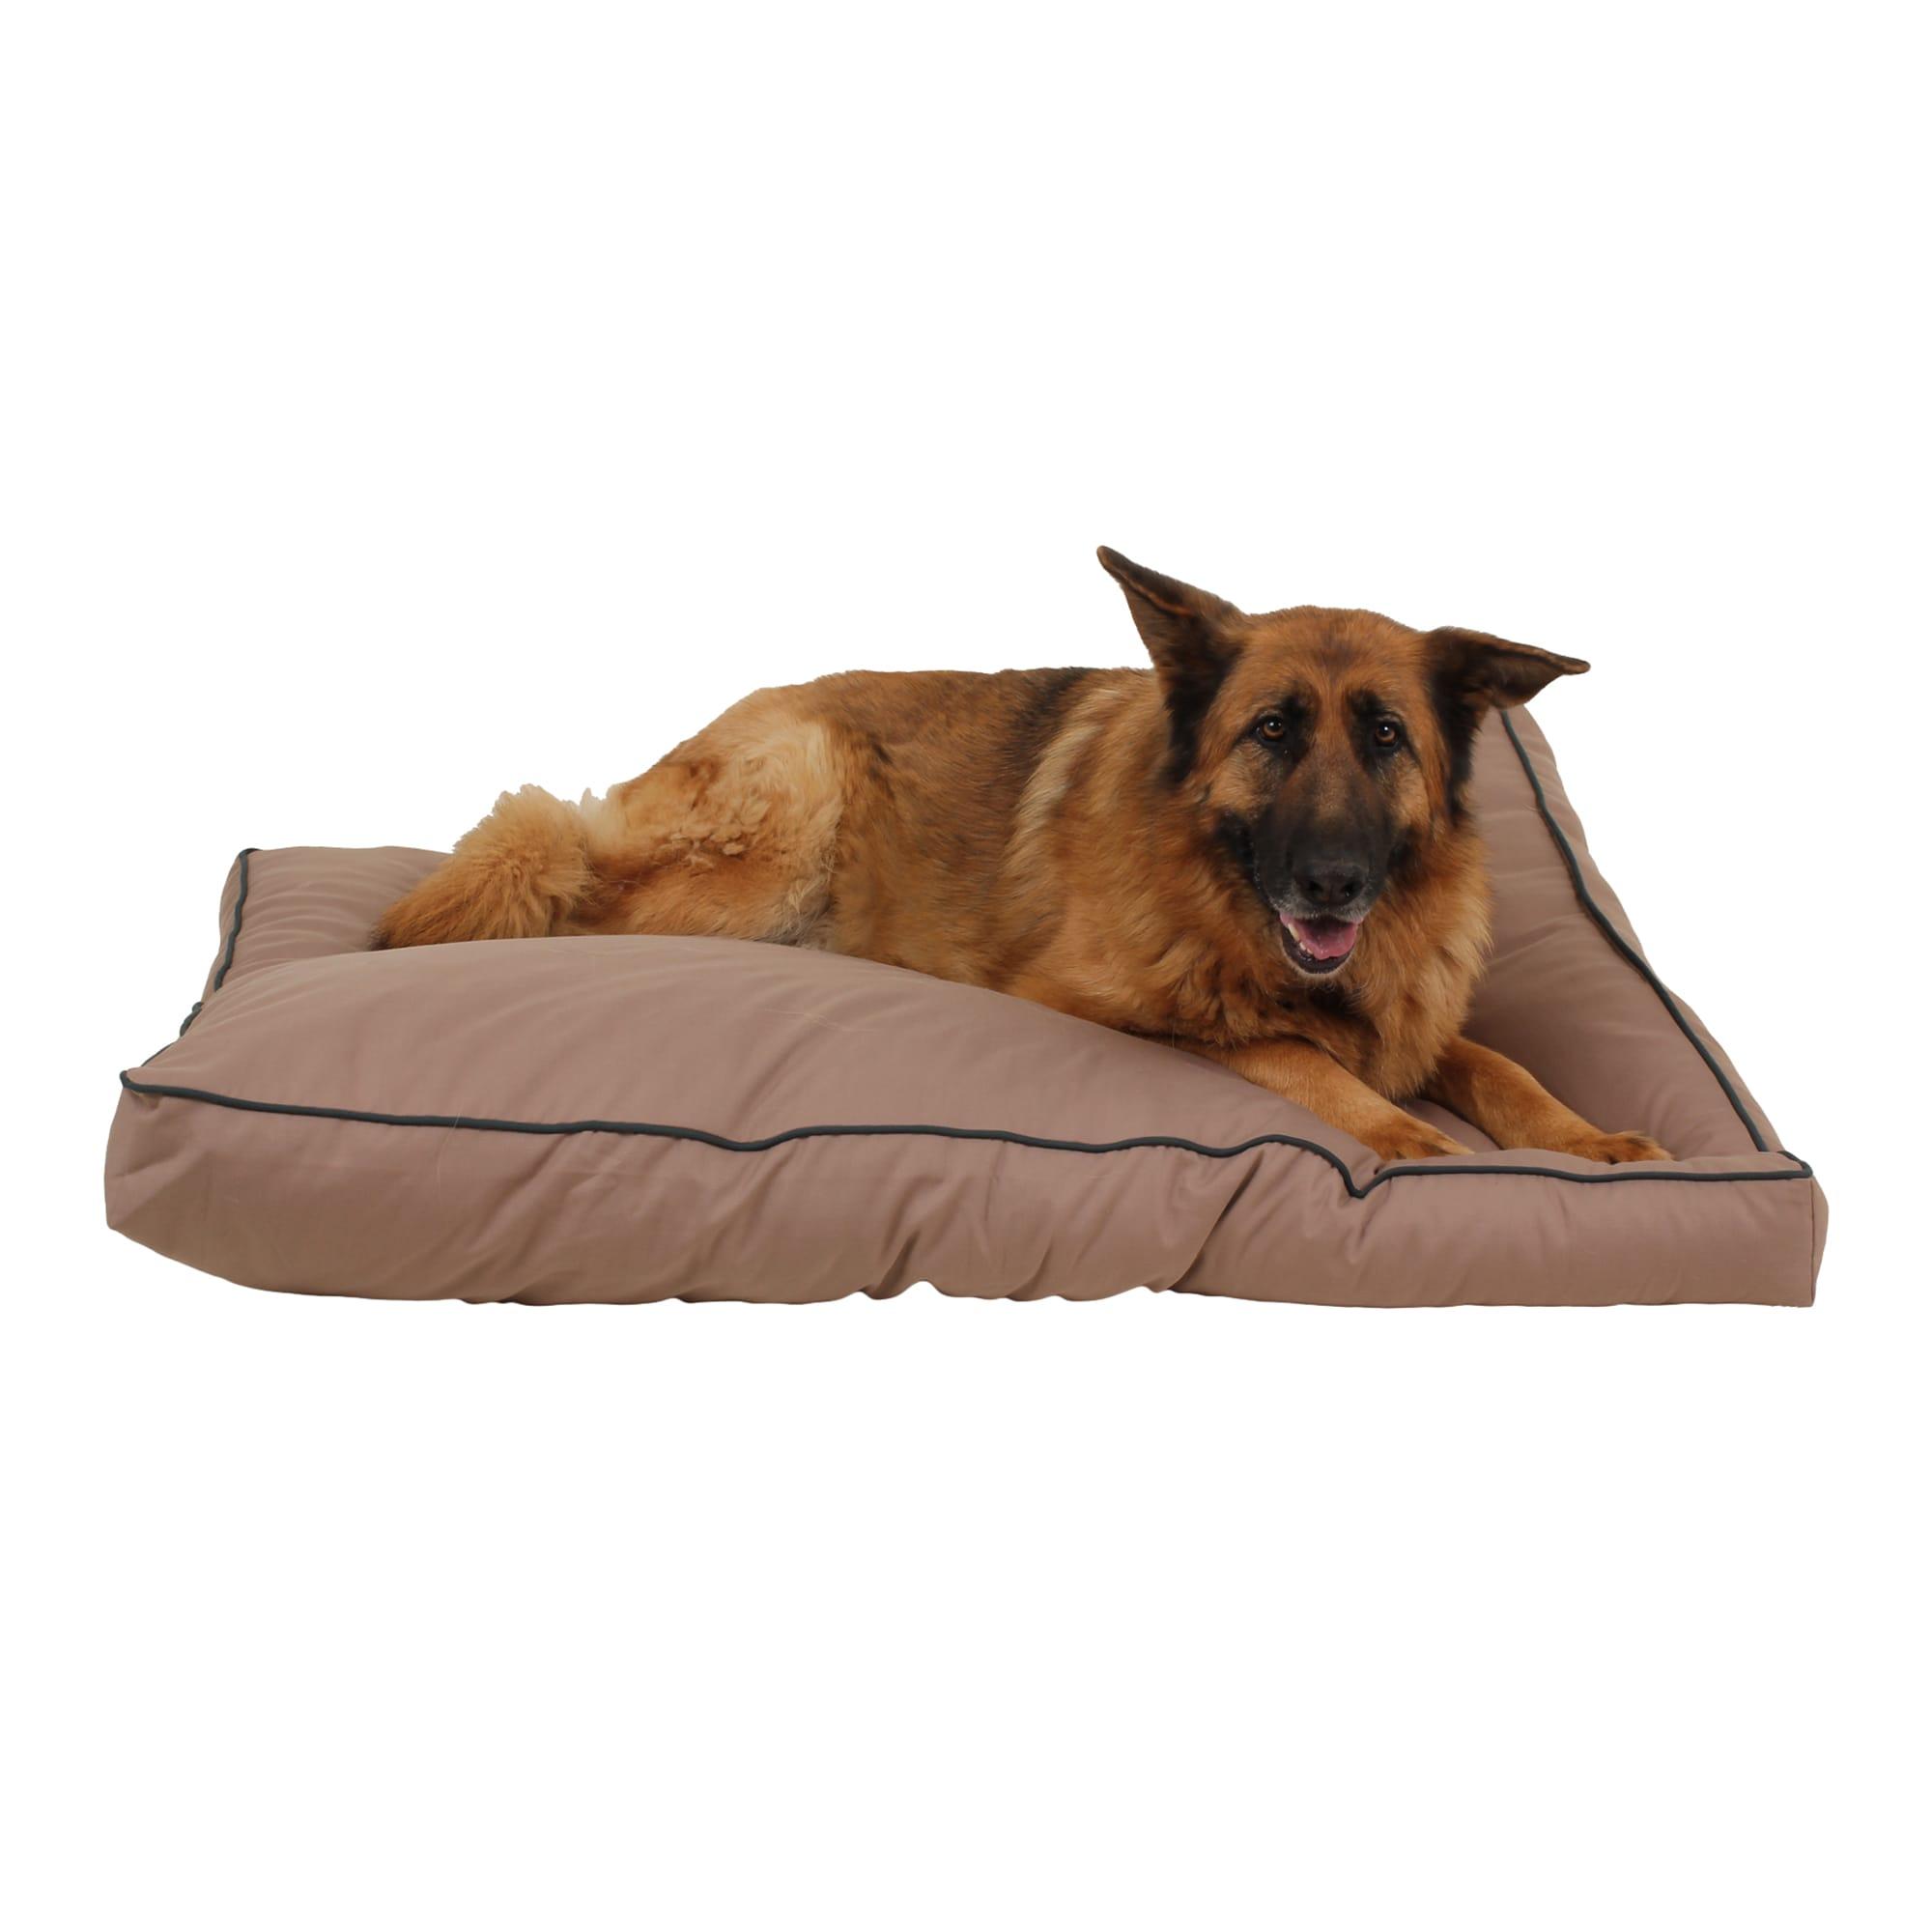 Carolina Pet Company Indoor Outdoor Jamison Tan Faux Gusset Dog Bed 42 L X 30 W Petco